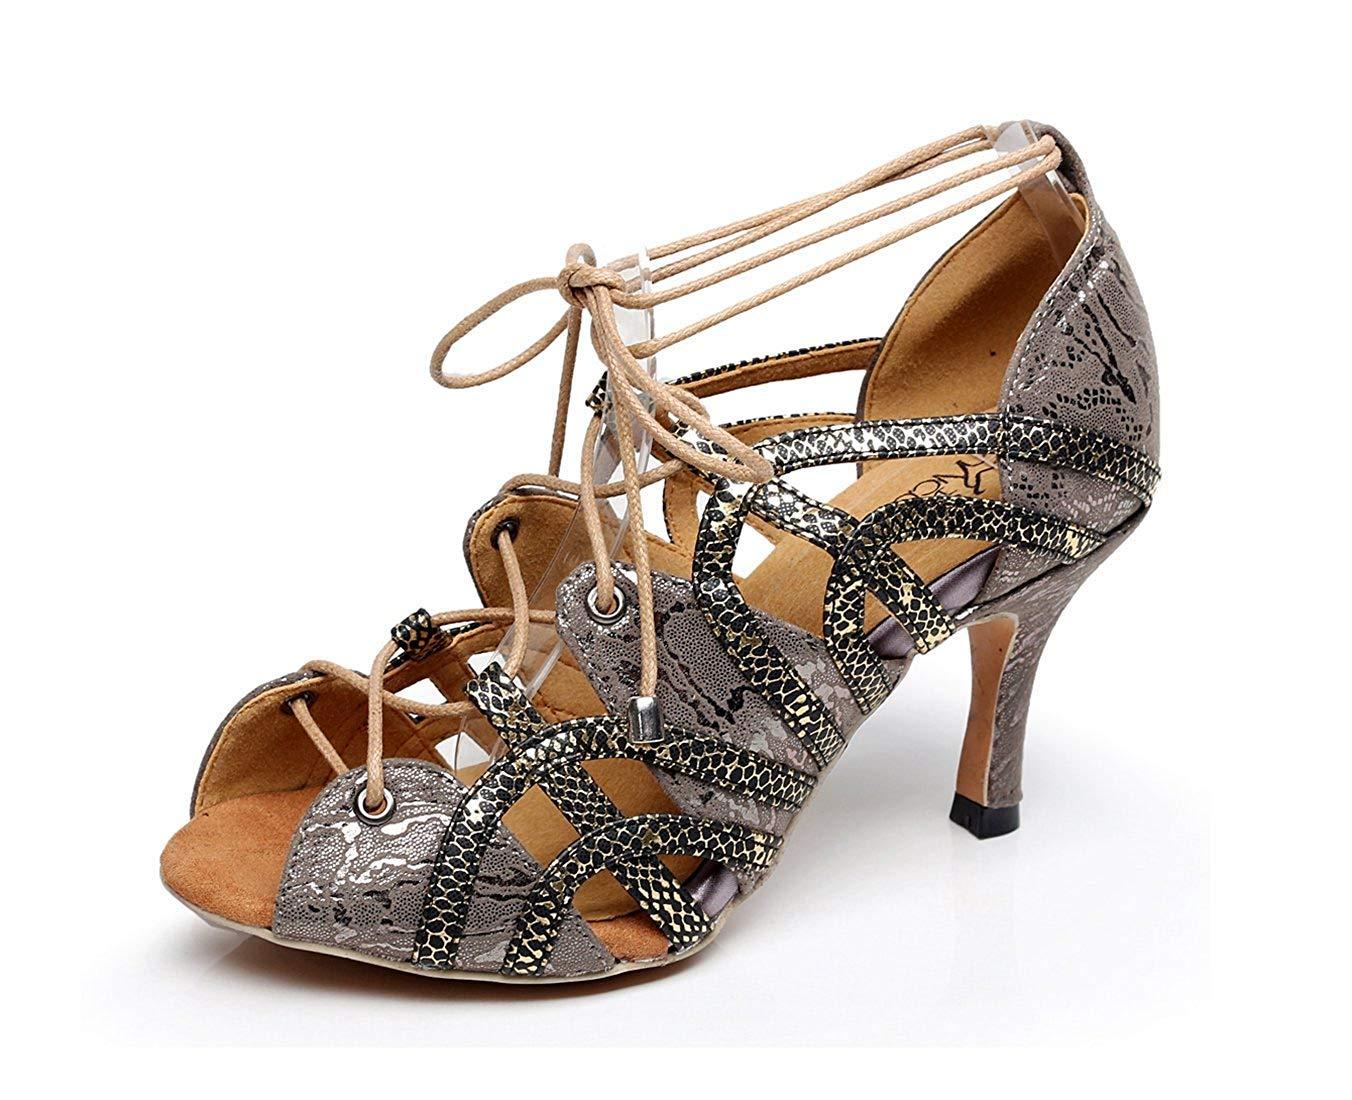 Qiusa Damen Soft Soft Soft Rubber Sole Peep Toe dunkelgrau synthetische Salsa Latin Dancing Schuhe Party Sandalen UK 5 (Farbe   - Größe   -) 05a139